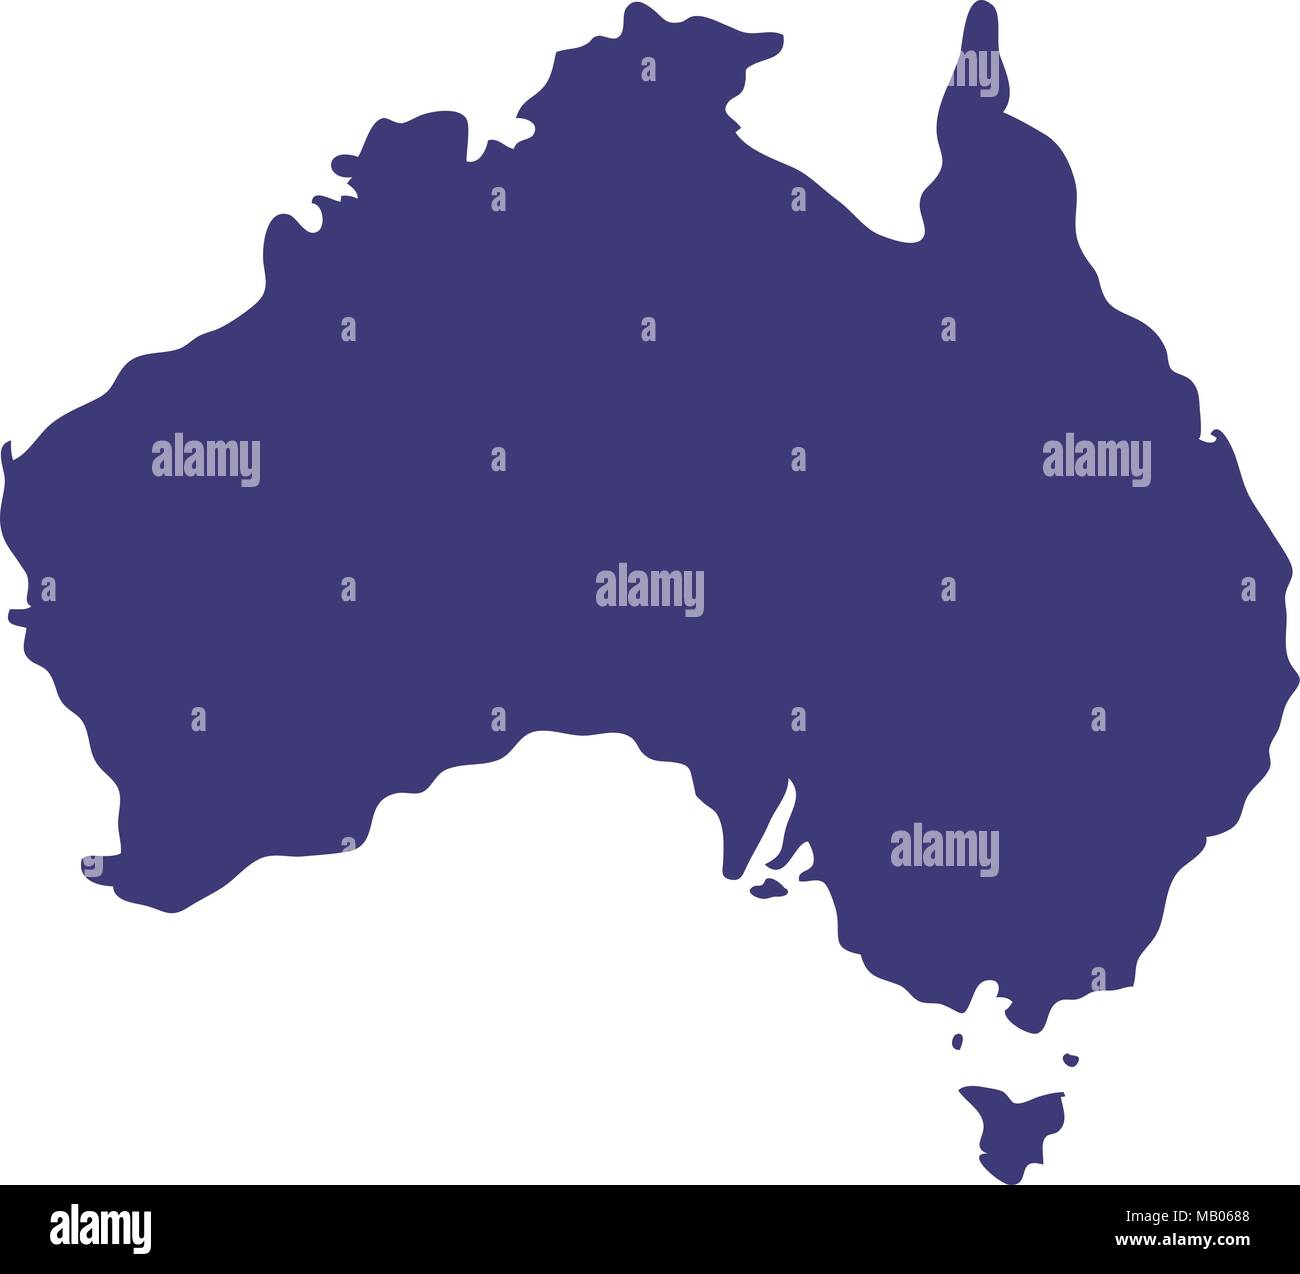 Australia Map Icon.Australia Map Geography Icon Stock Vector Art Illustration